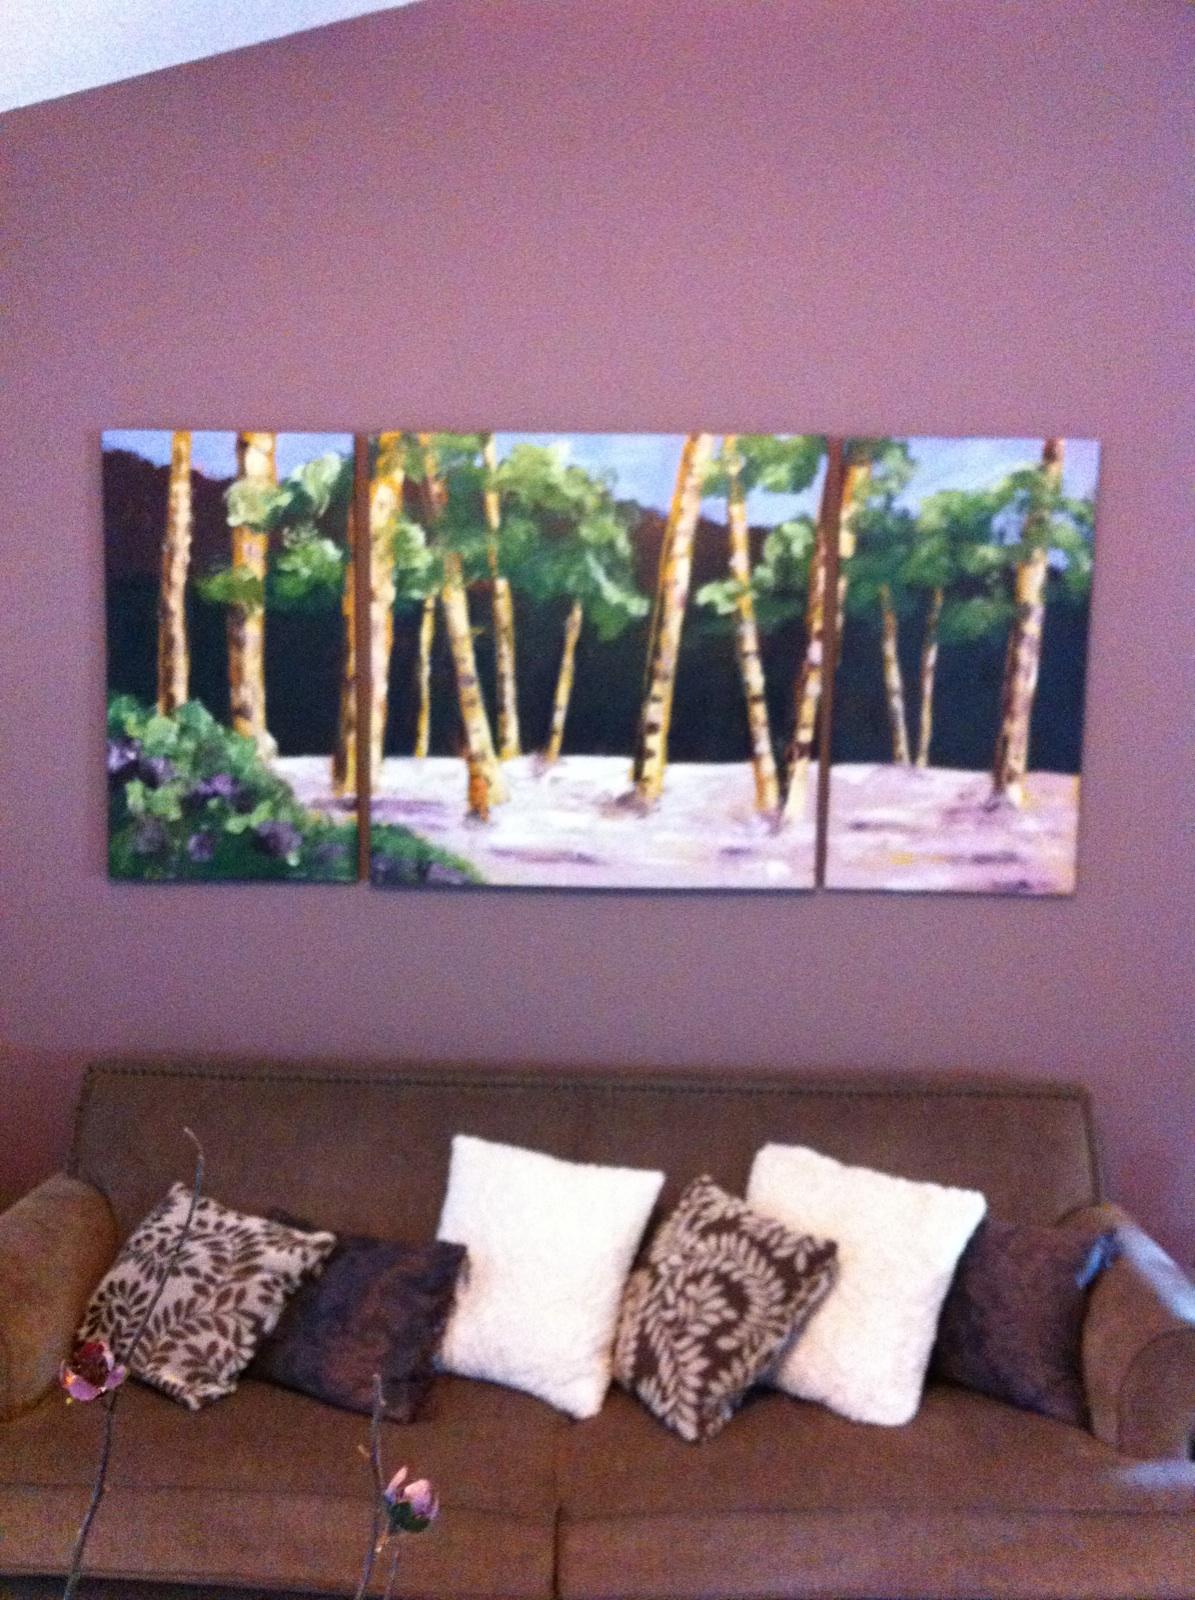 custom-art-commissions-by-greensboro-artist-tracey-marshall-img_1393_1.jpg